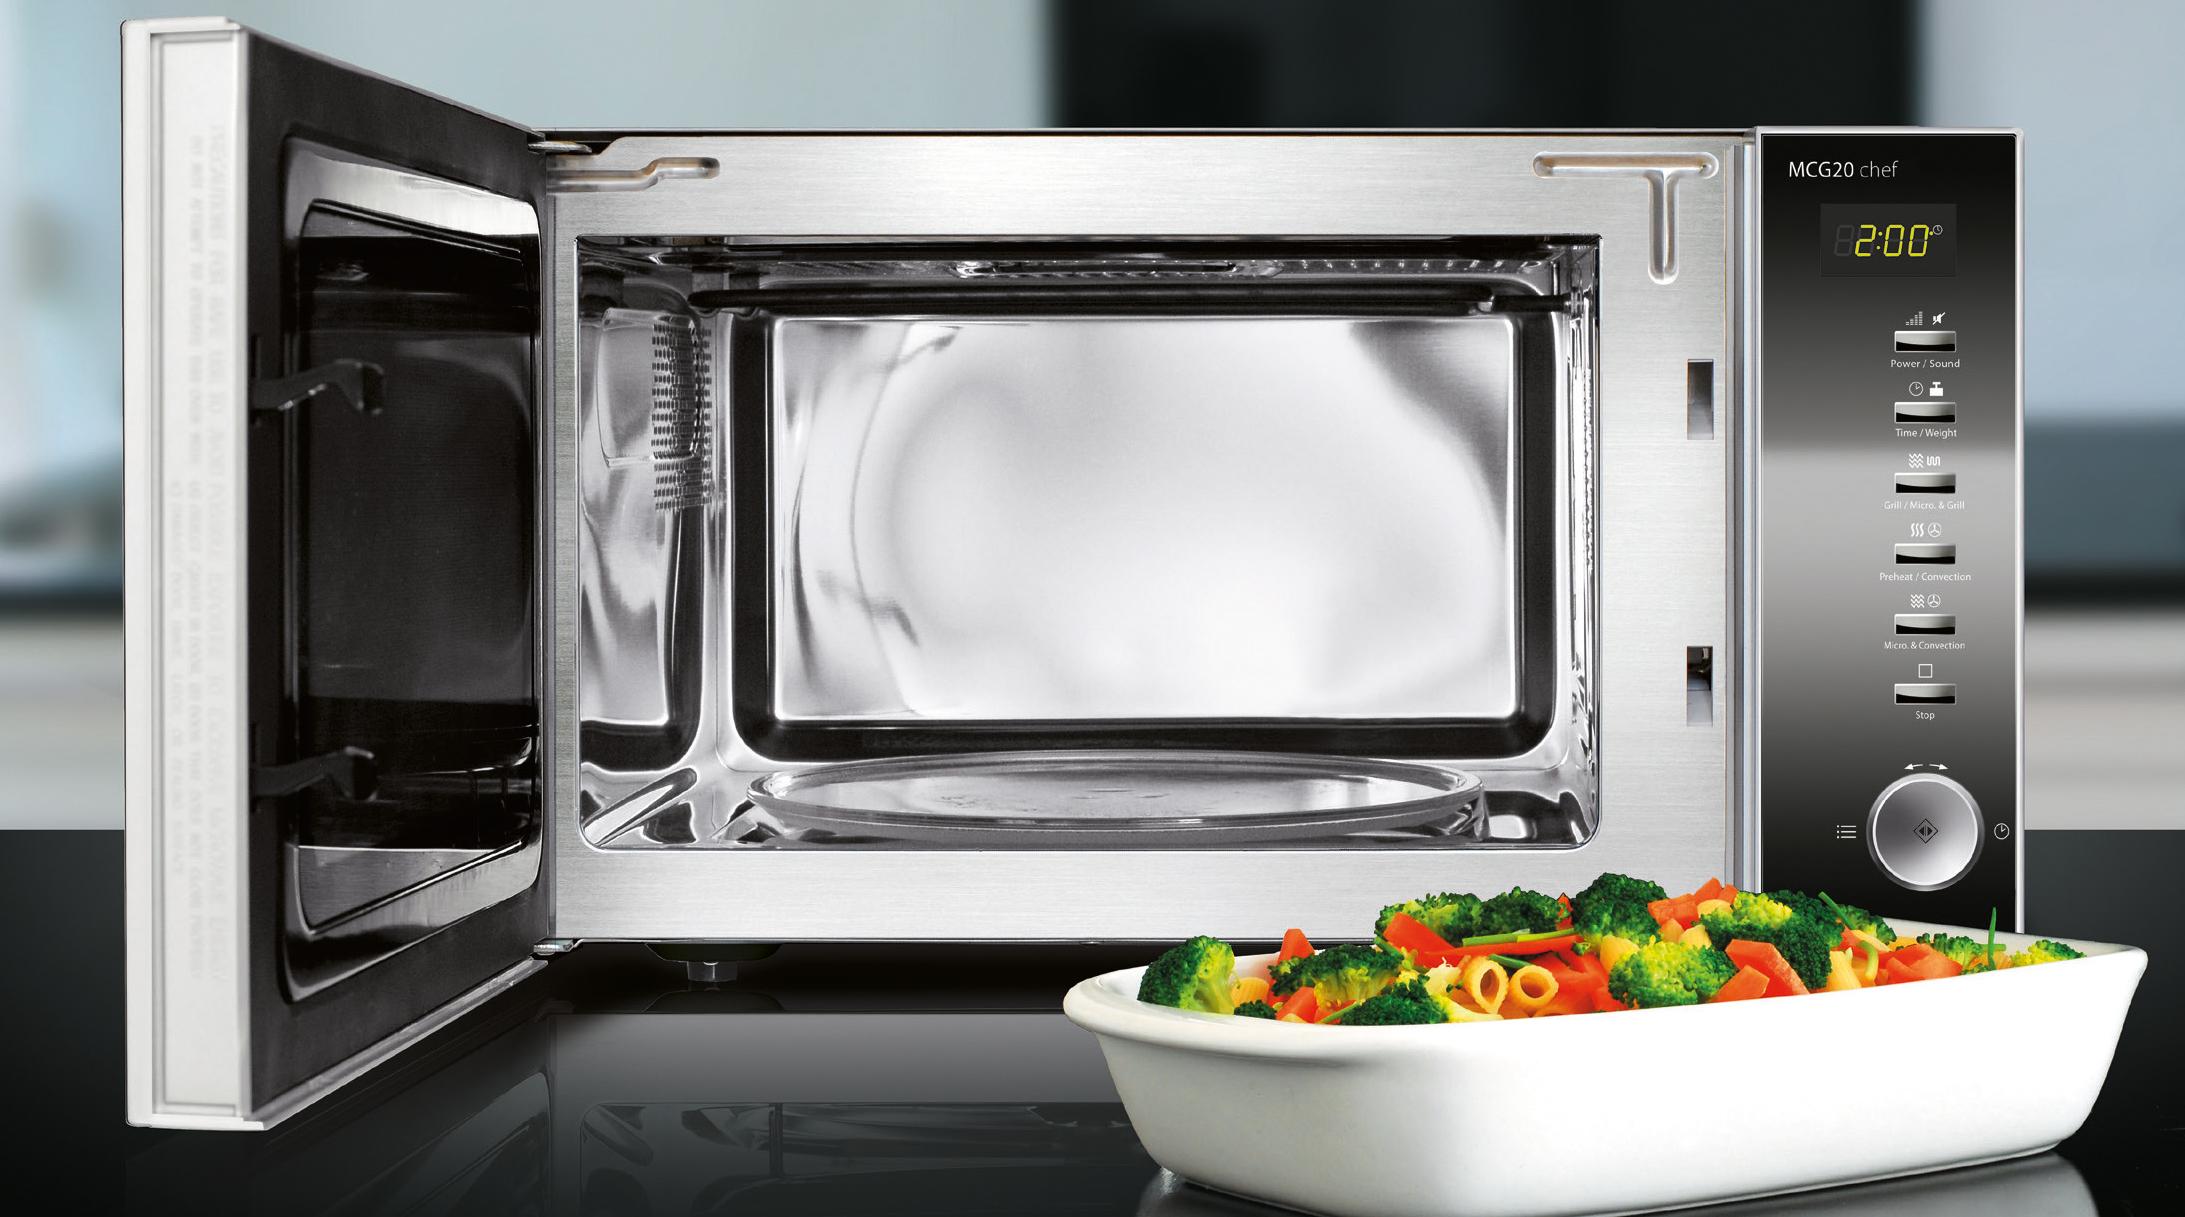 mikrowelle hei luft grill caso mcg 20 chef caso design onlineshop. Black Bedroom Furniture Sets. Home Design Ideas